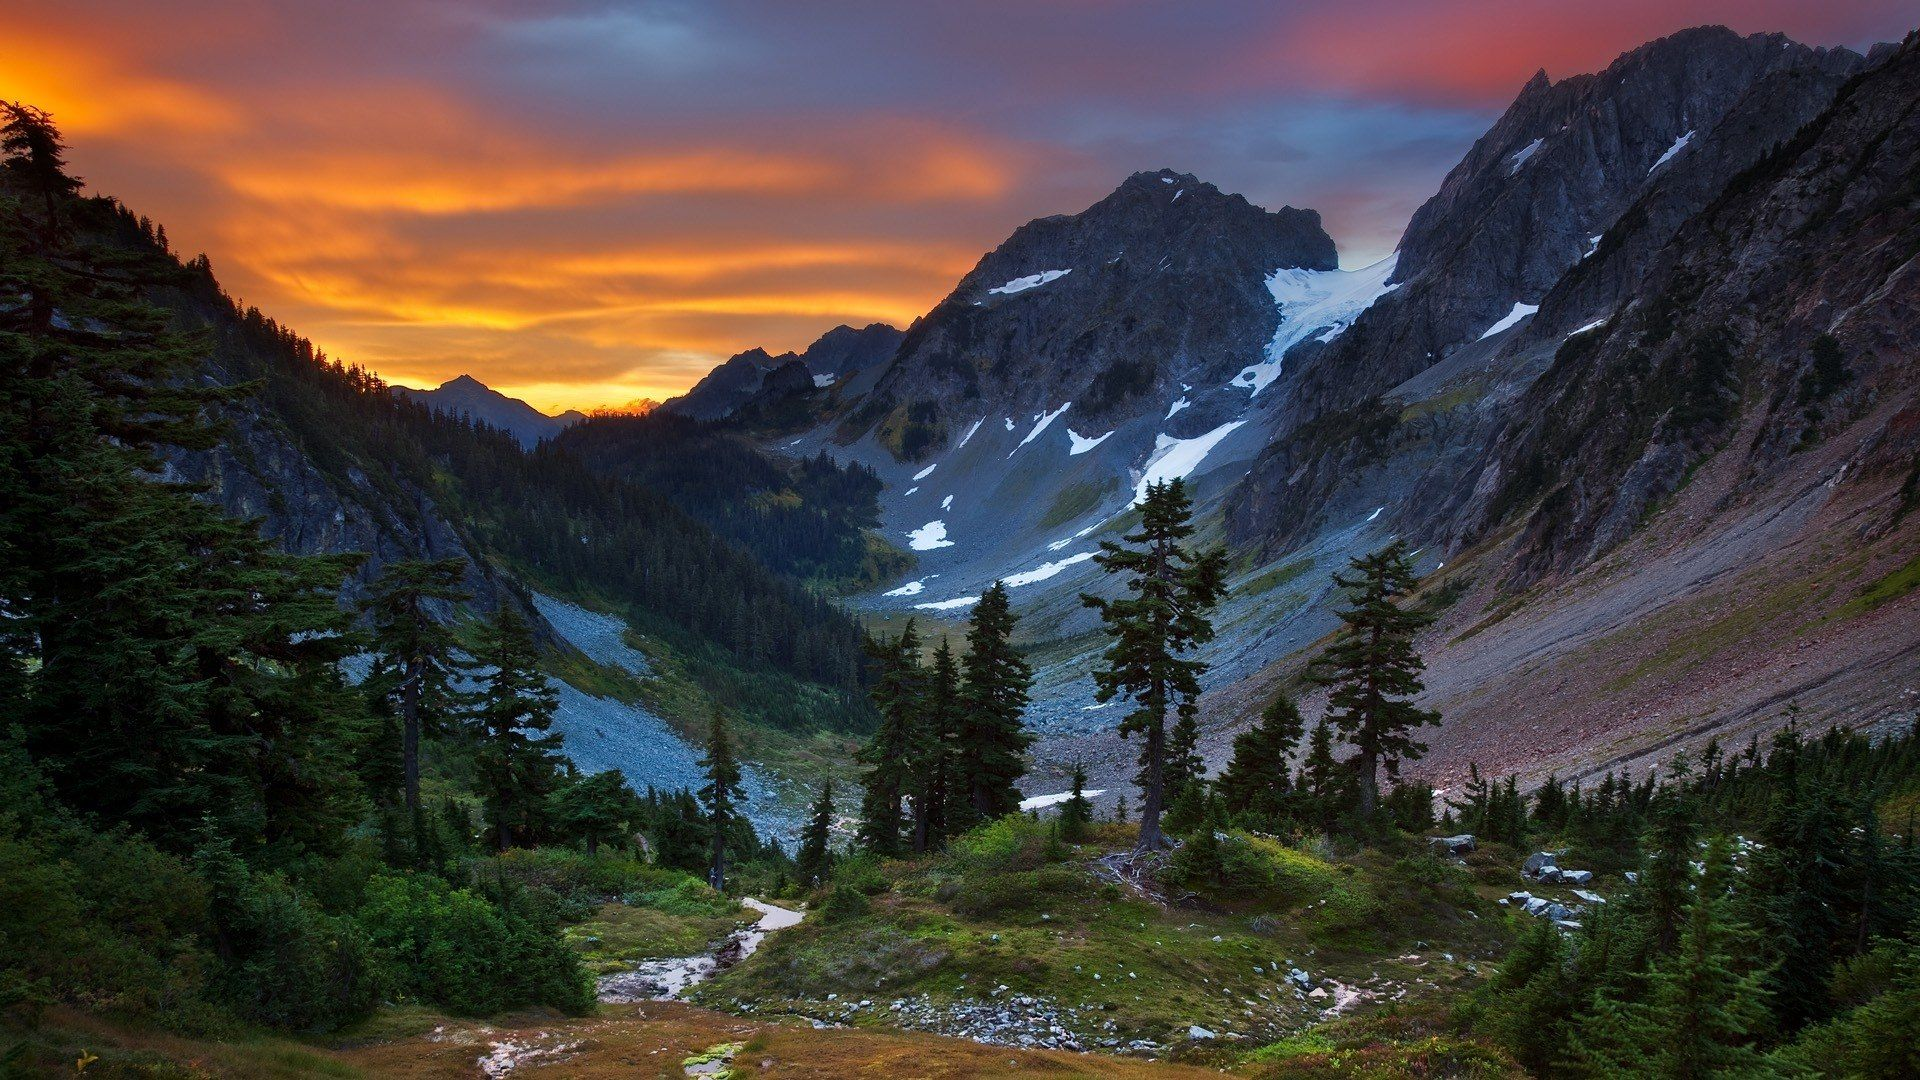 Great Wallpaper Mountain Google - a27825ca8153b4279f1148c1434c8be1  Photograph_436569.jpg